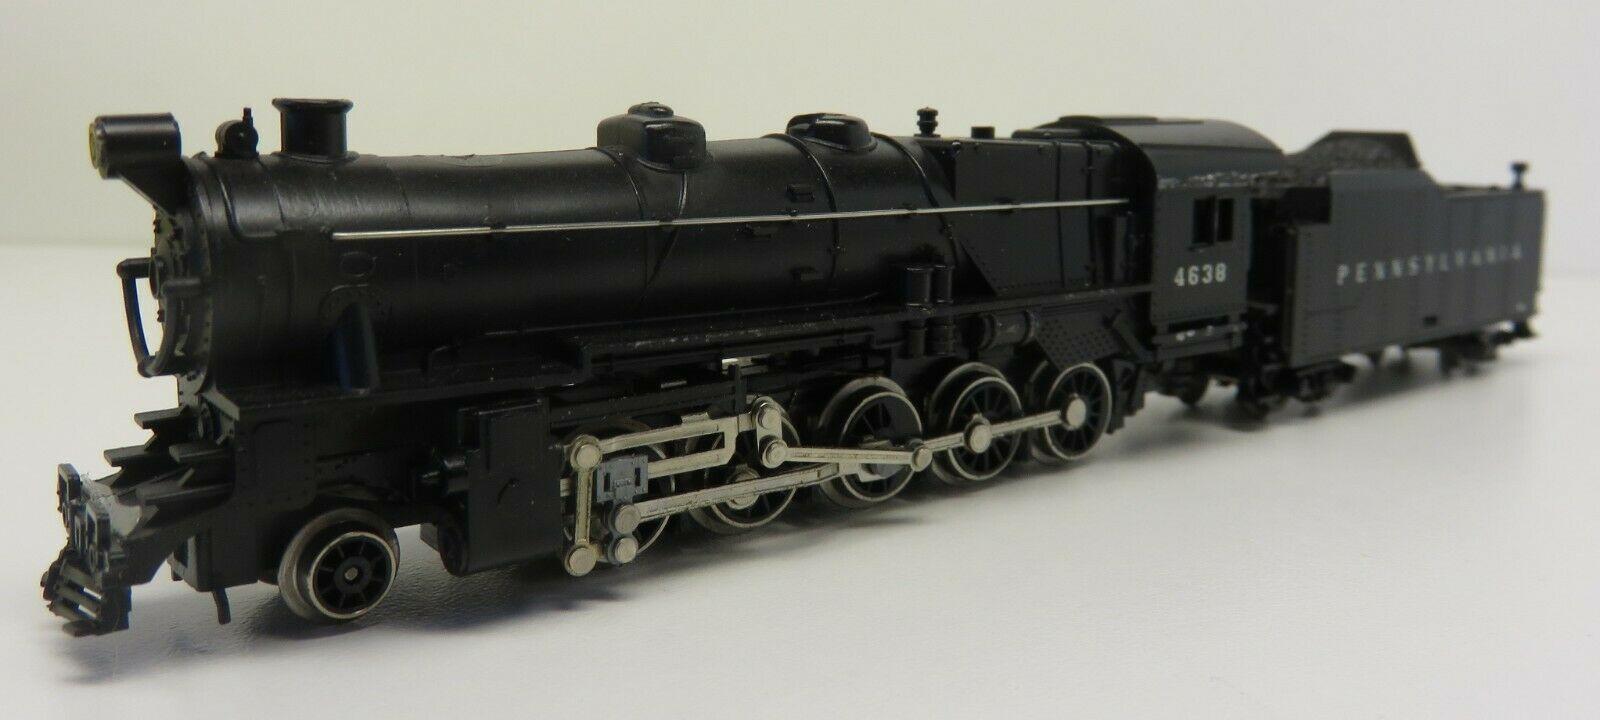 N Scale - Minitrix - 2072 - Locomotive, Steam, 2-10-0 Decapod - Pennsylvania - 4638